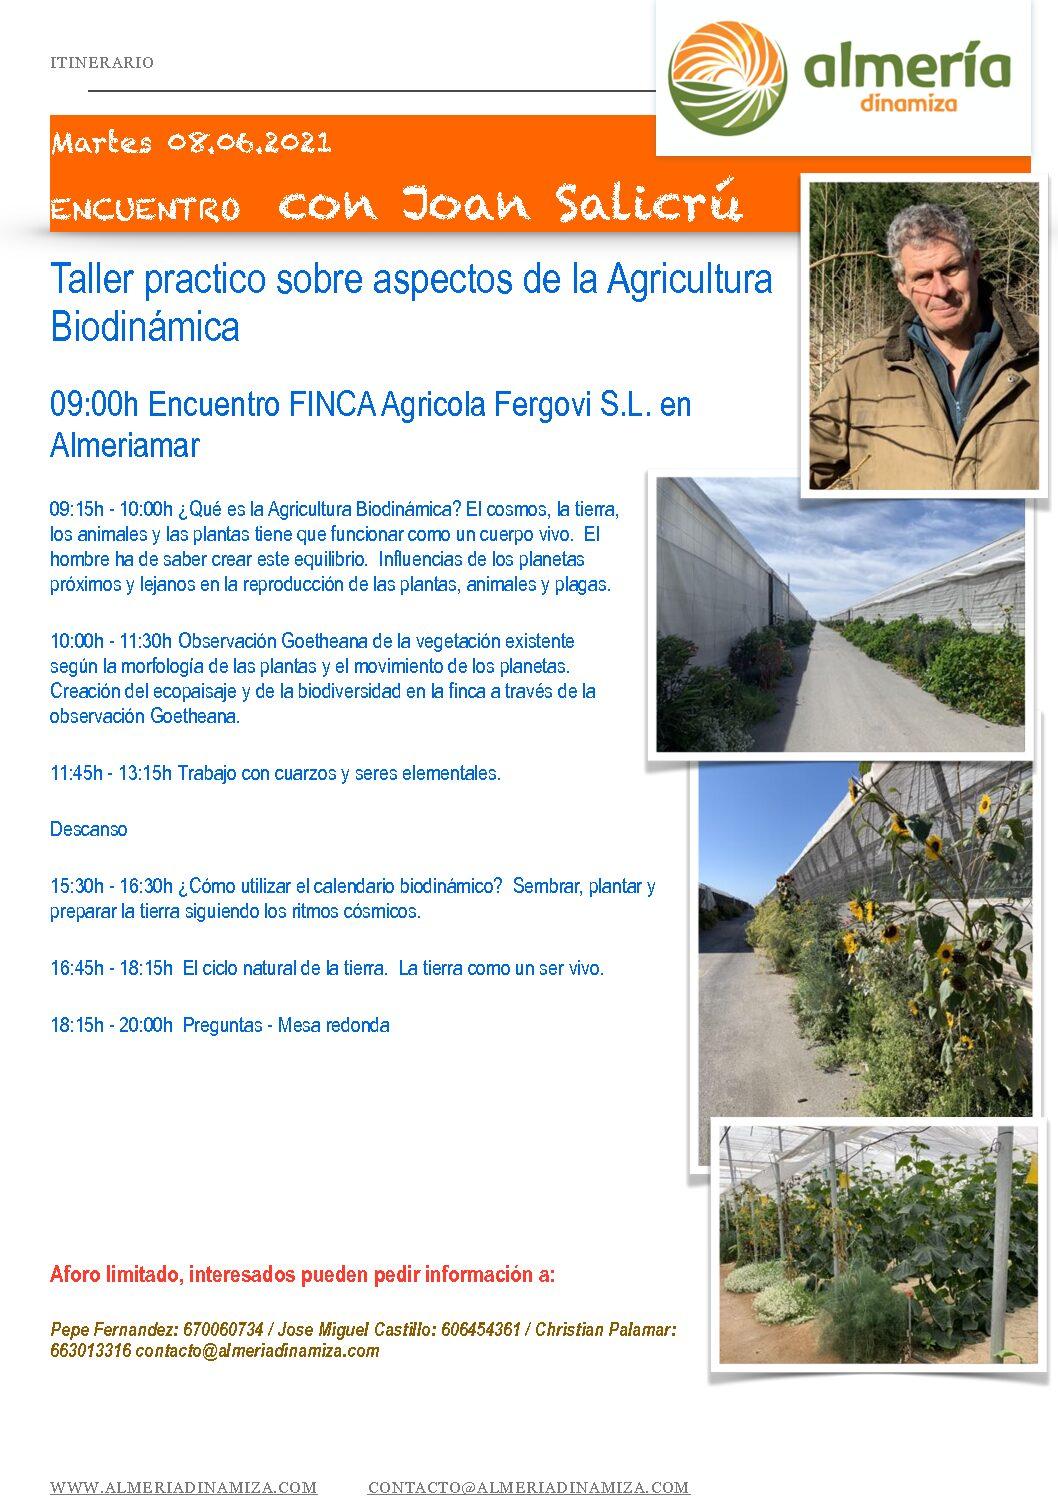 TALLER PRACTICO AGRICULTURA BIODINAMICA